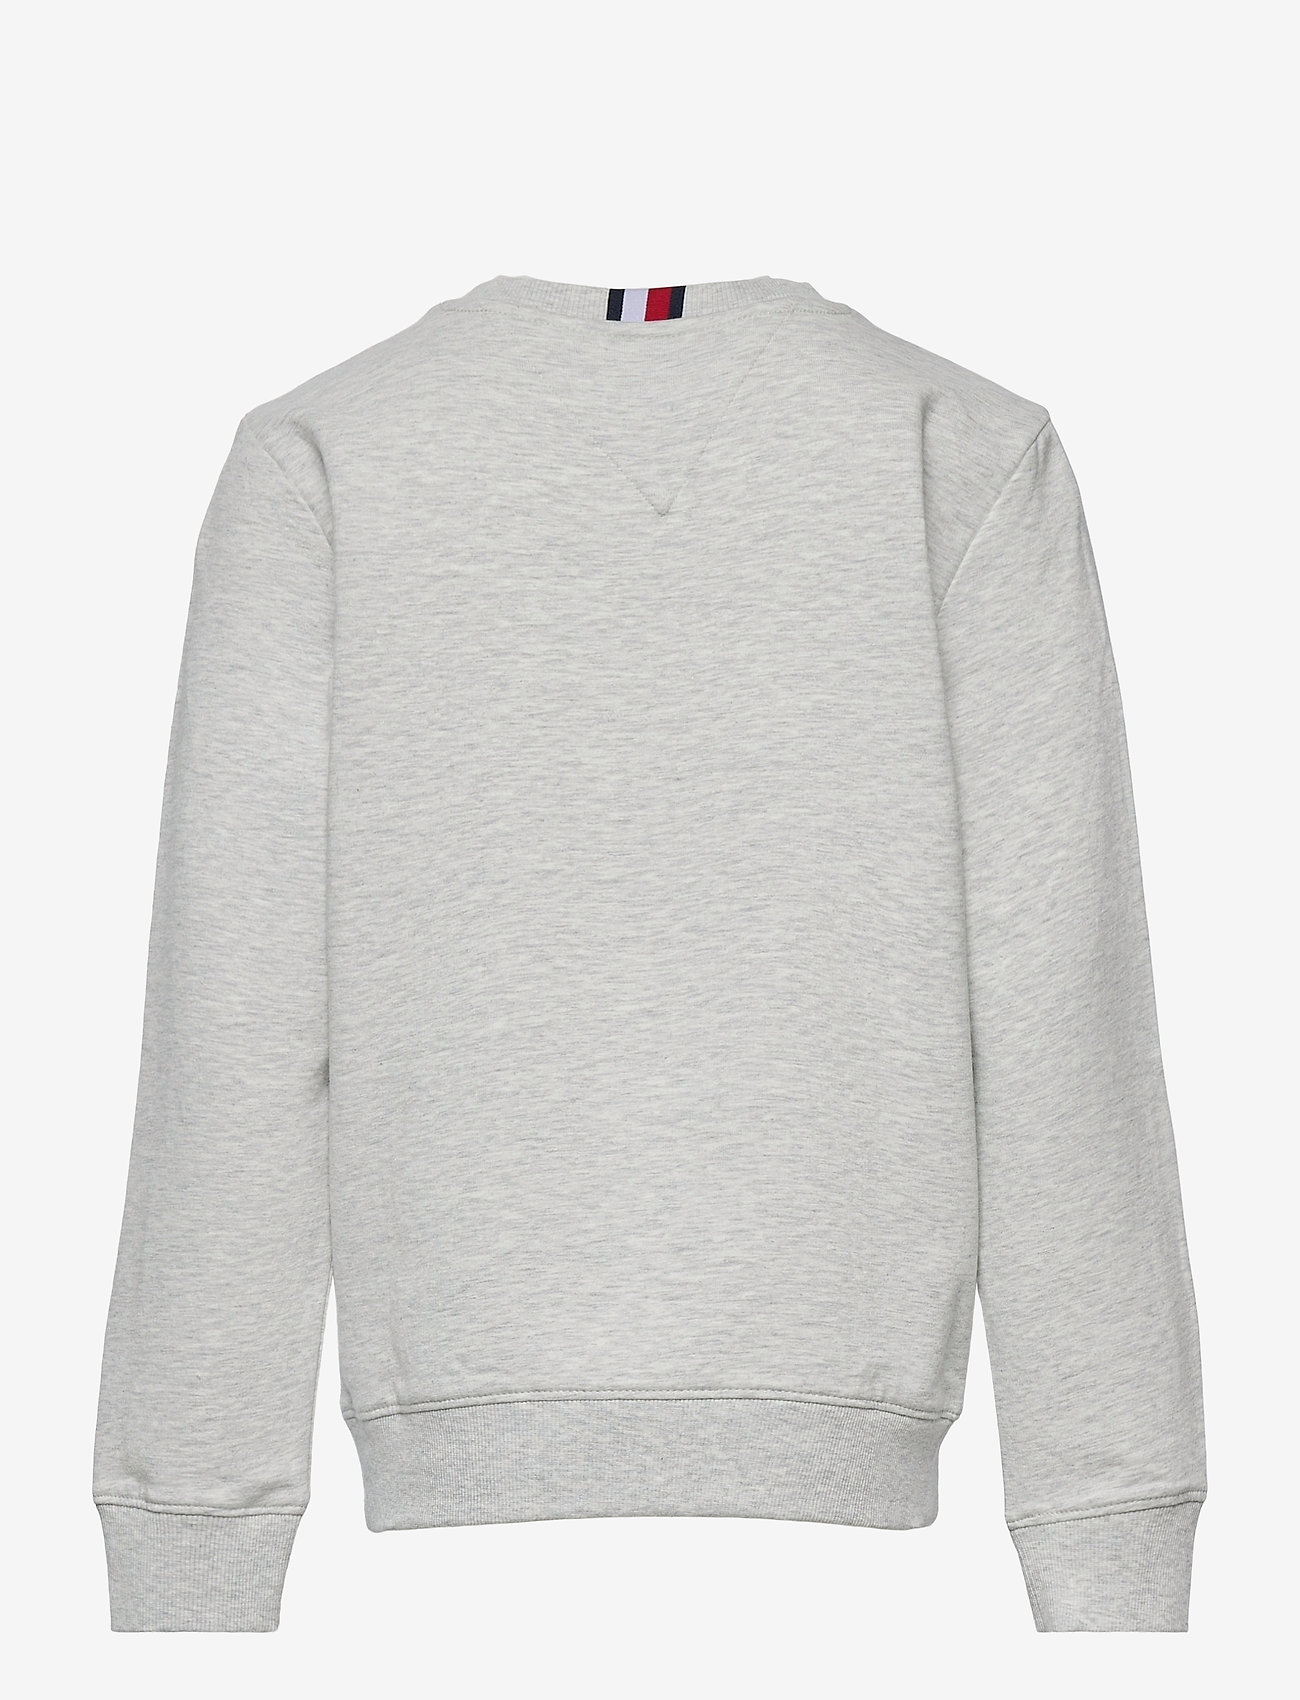 Tommy Hilfiger - FLAG RIB INSERT SWEATSHIRT - sweatshirts - light grey heather - 1